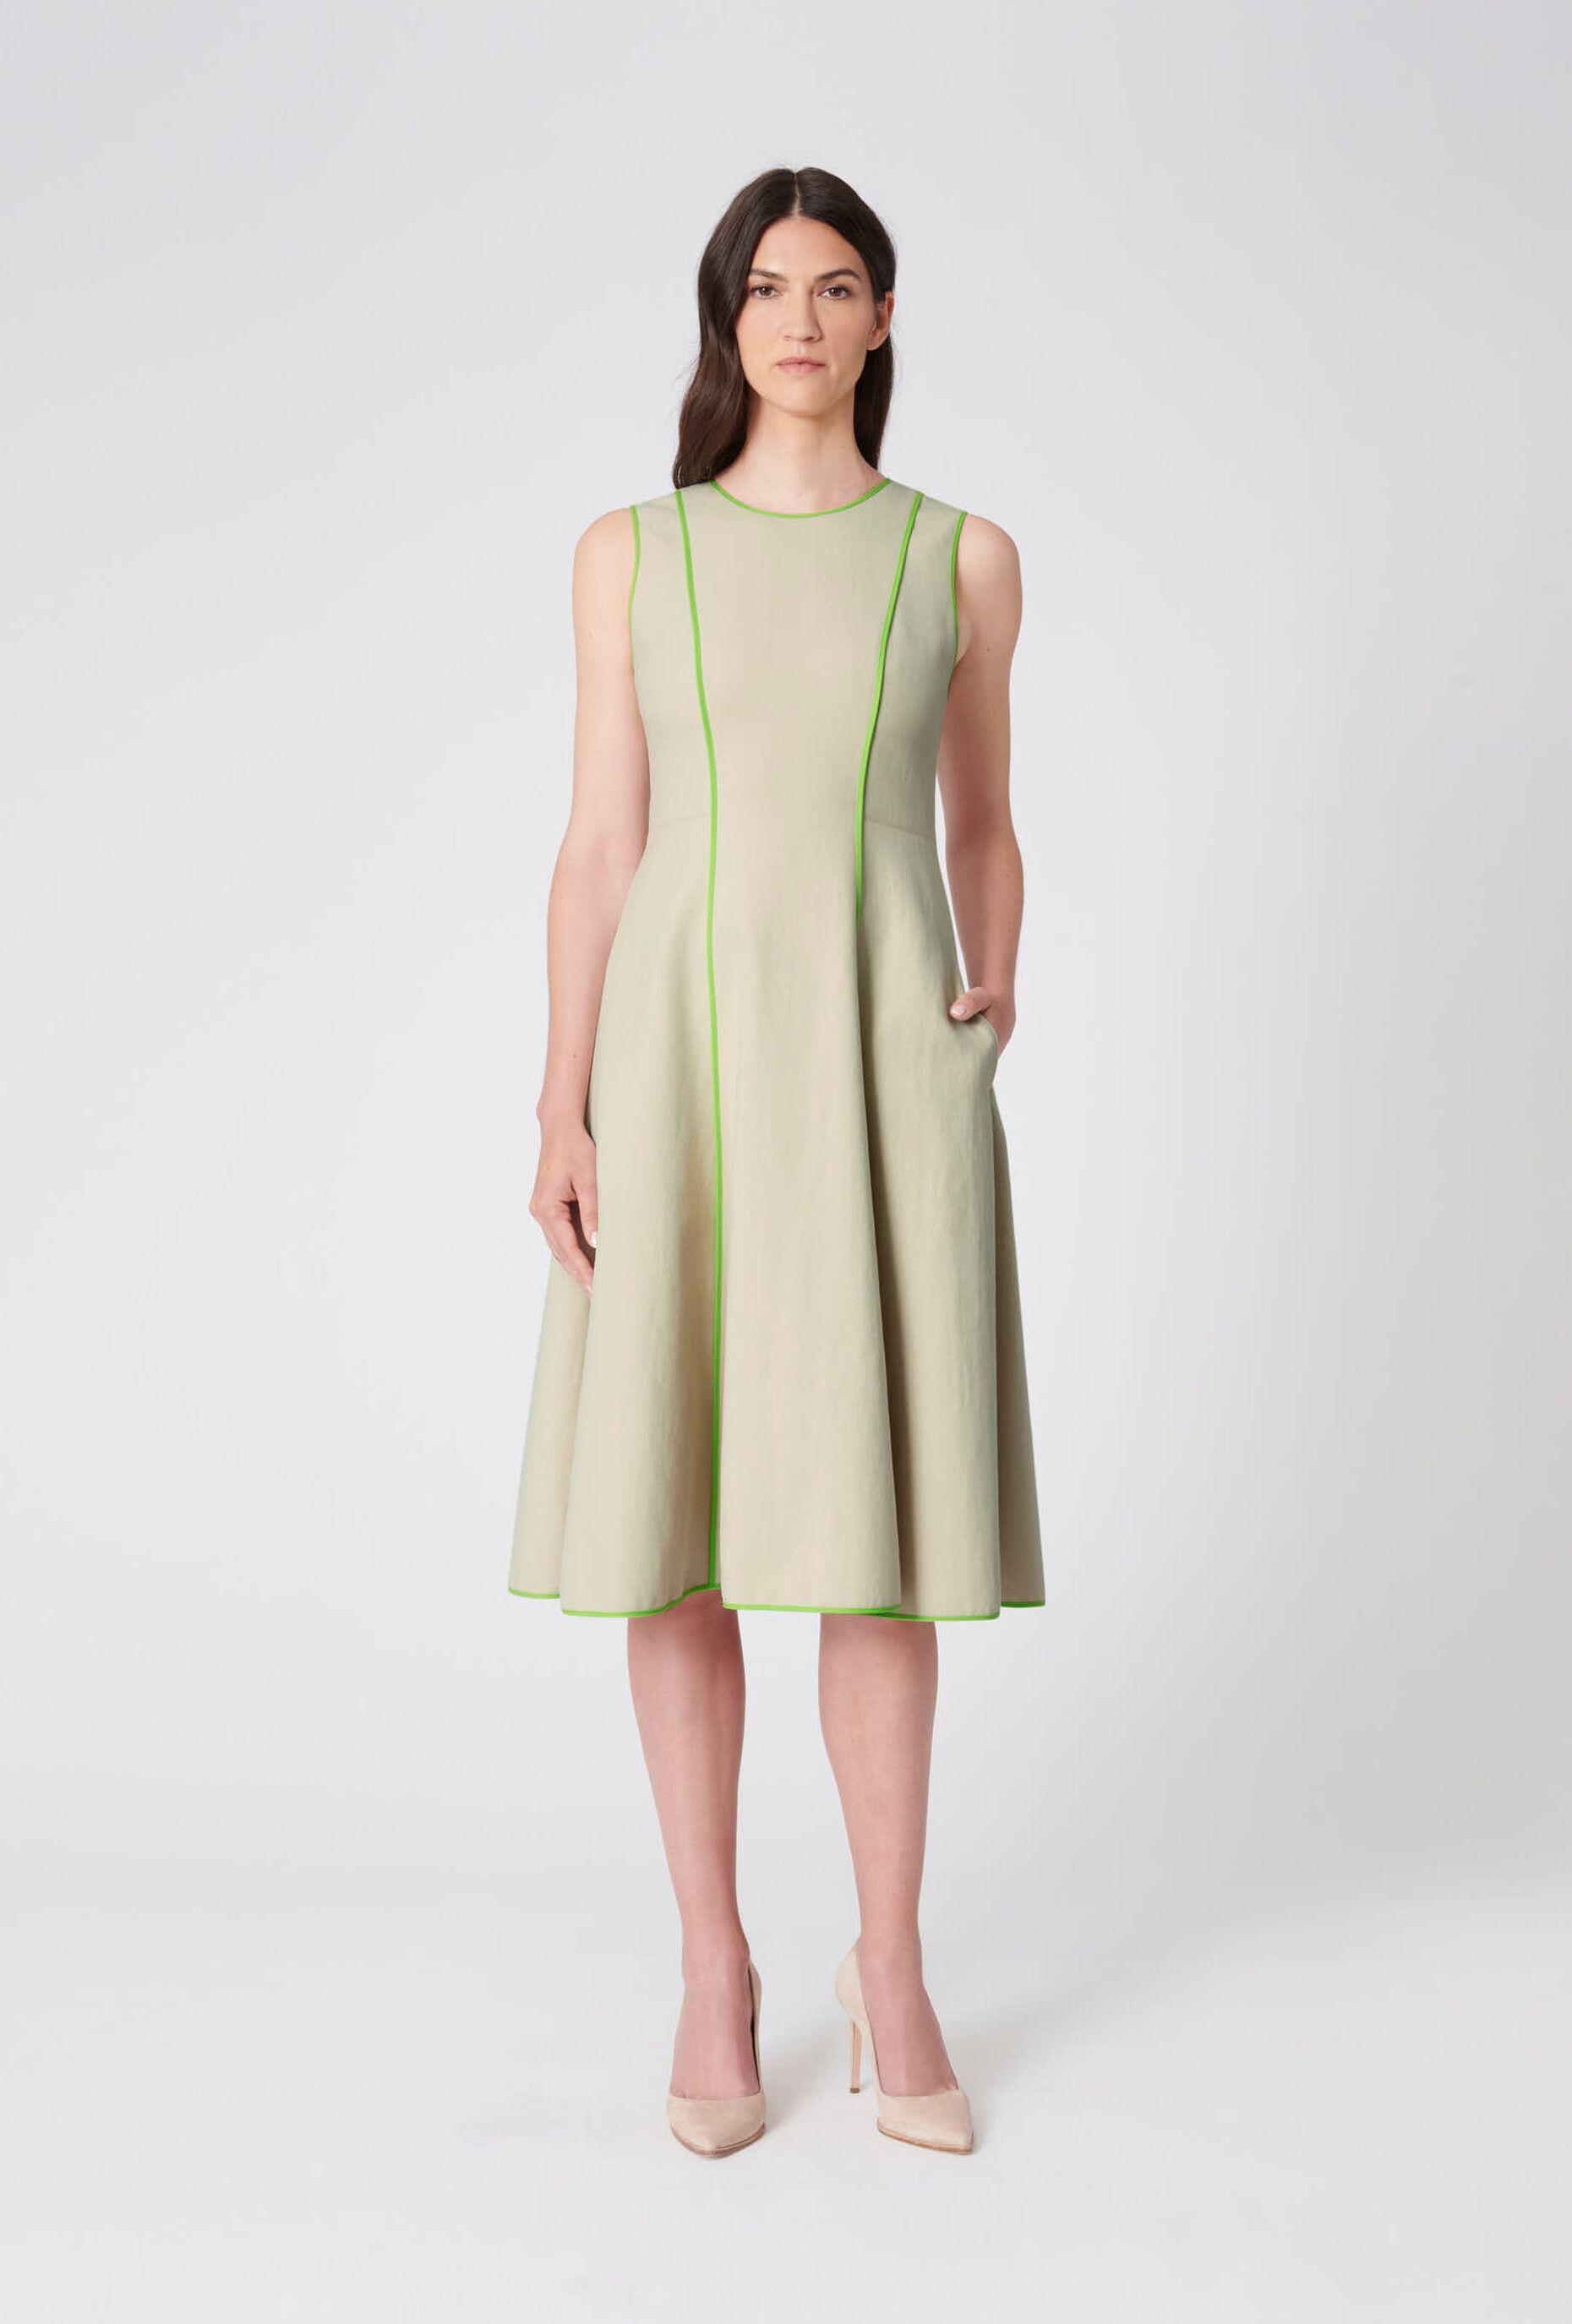 Paule Ka  Woven dress, Cotton dresses, Cotton midi dress